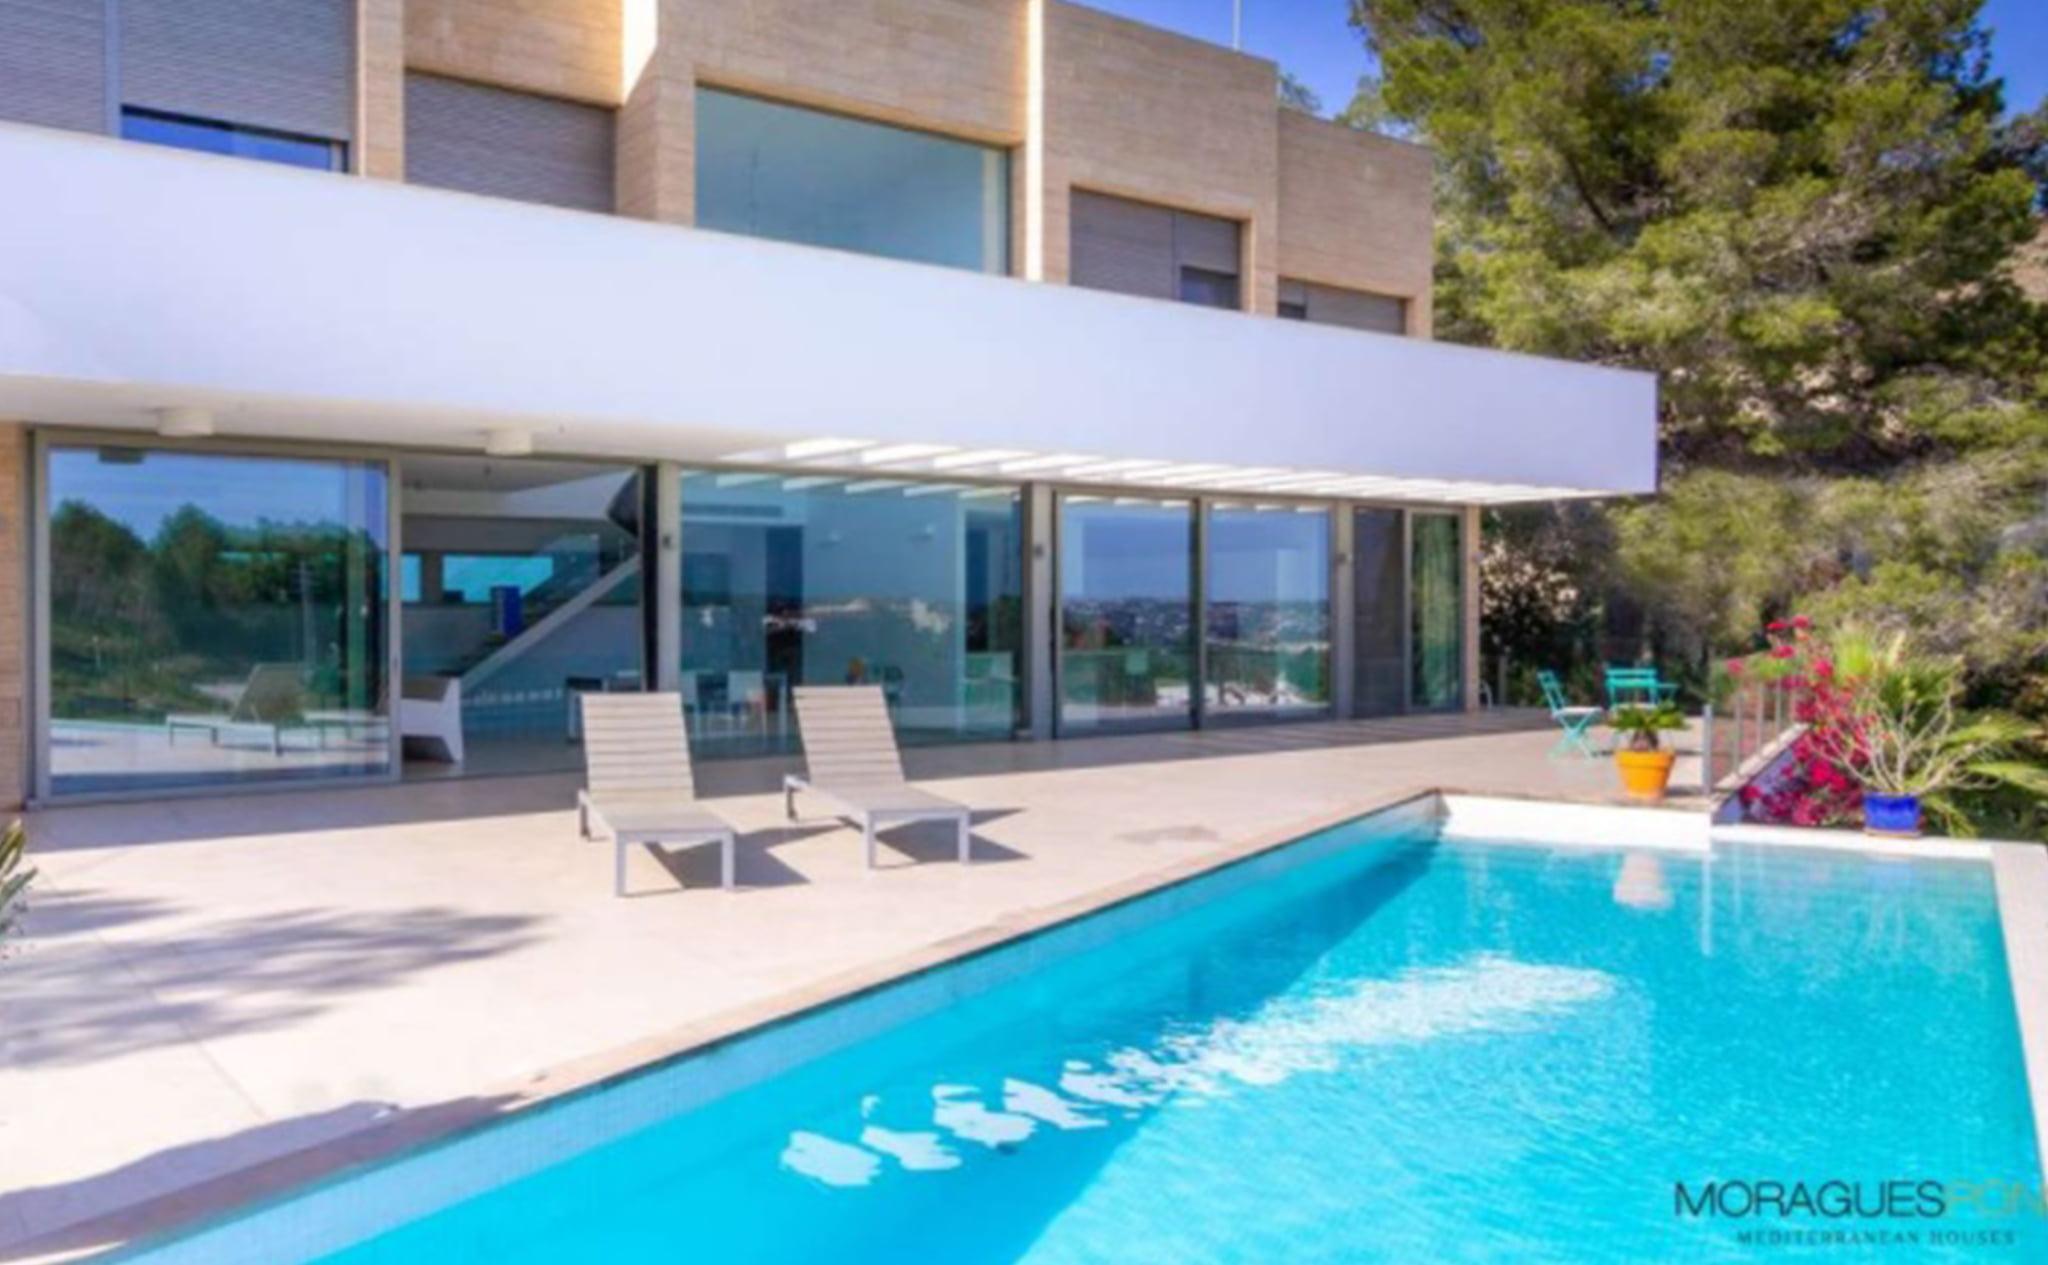 Casa moderna en venta en Jávea – MORAGUESPONS Mediterranean Houses